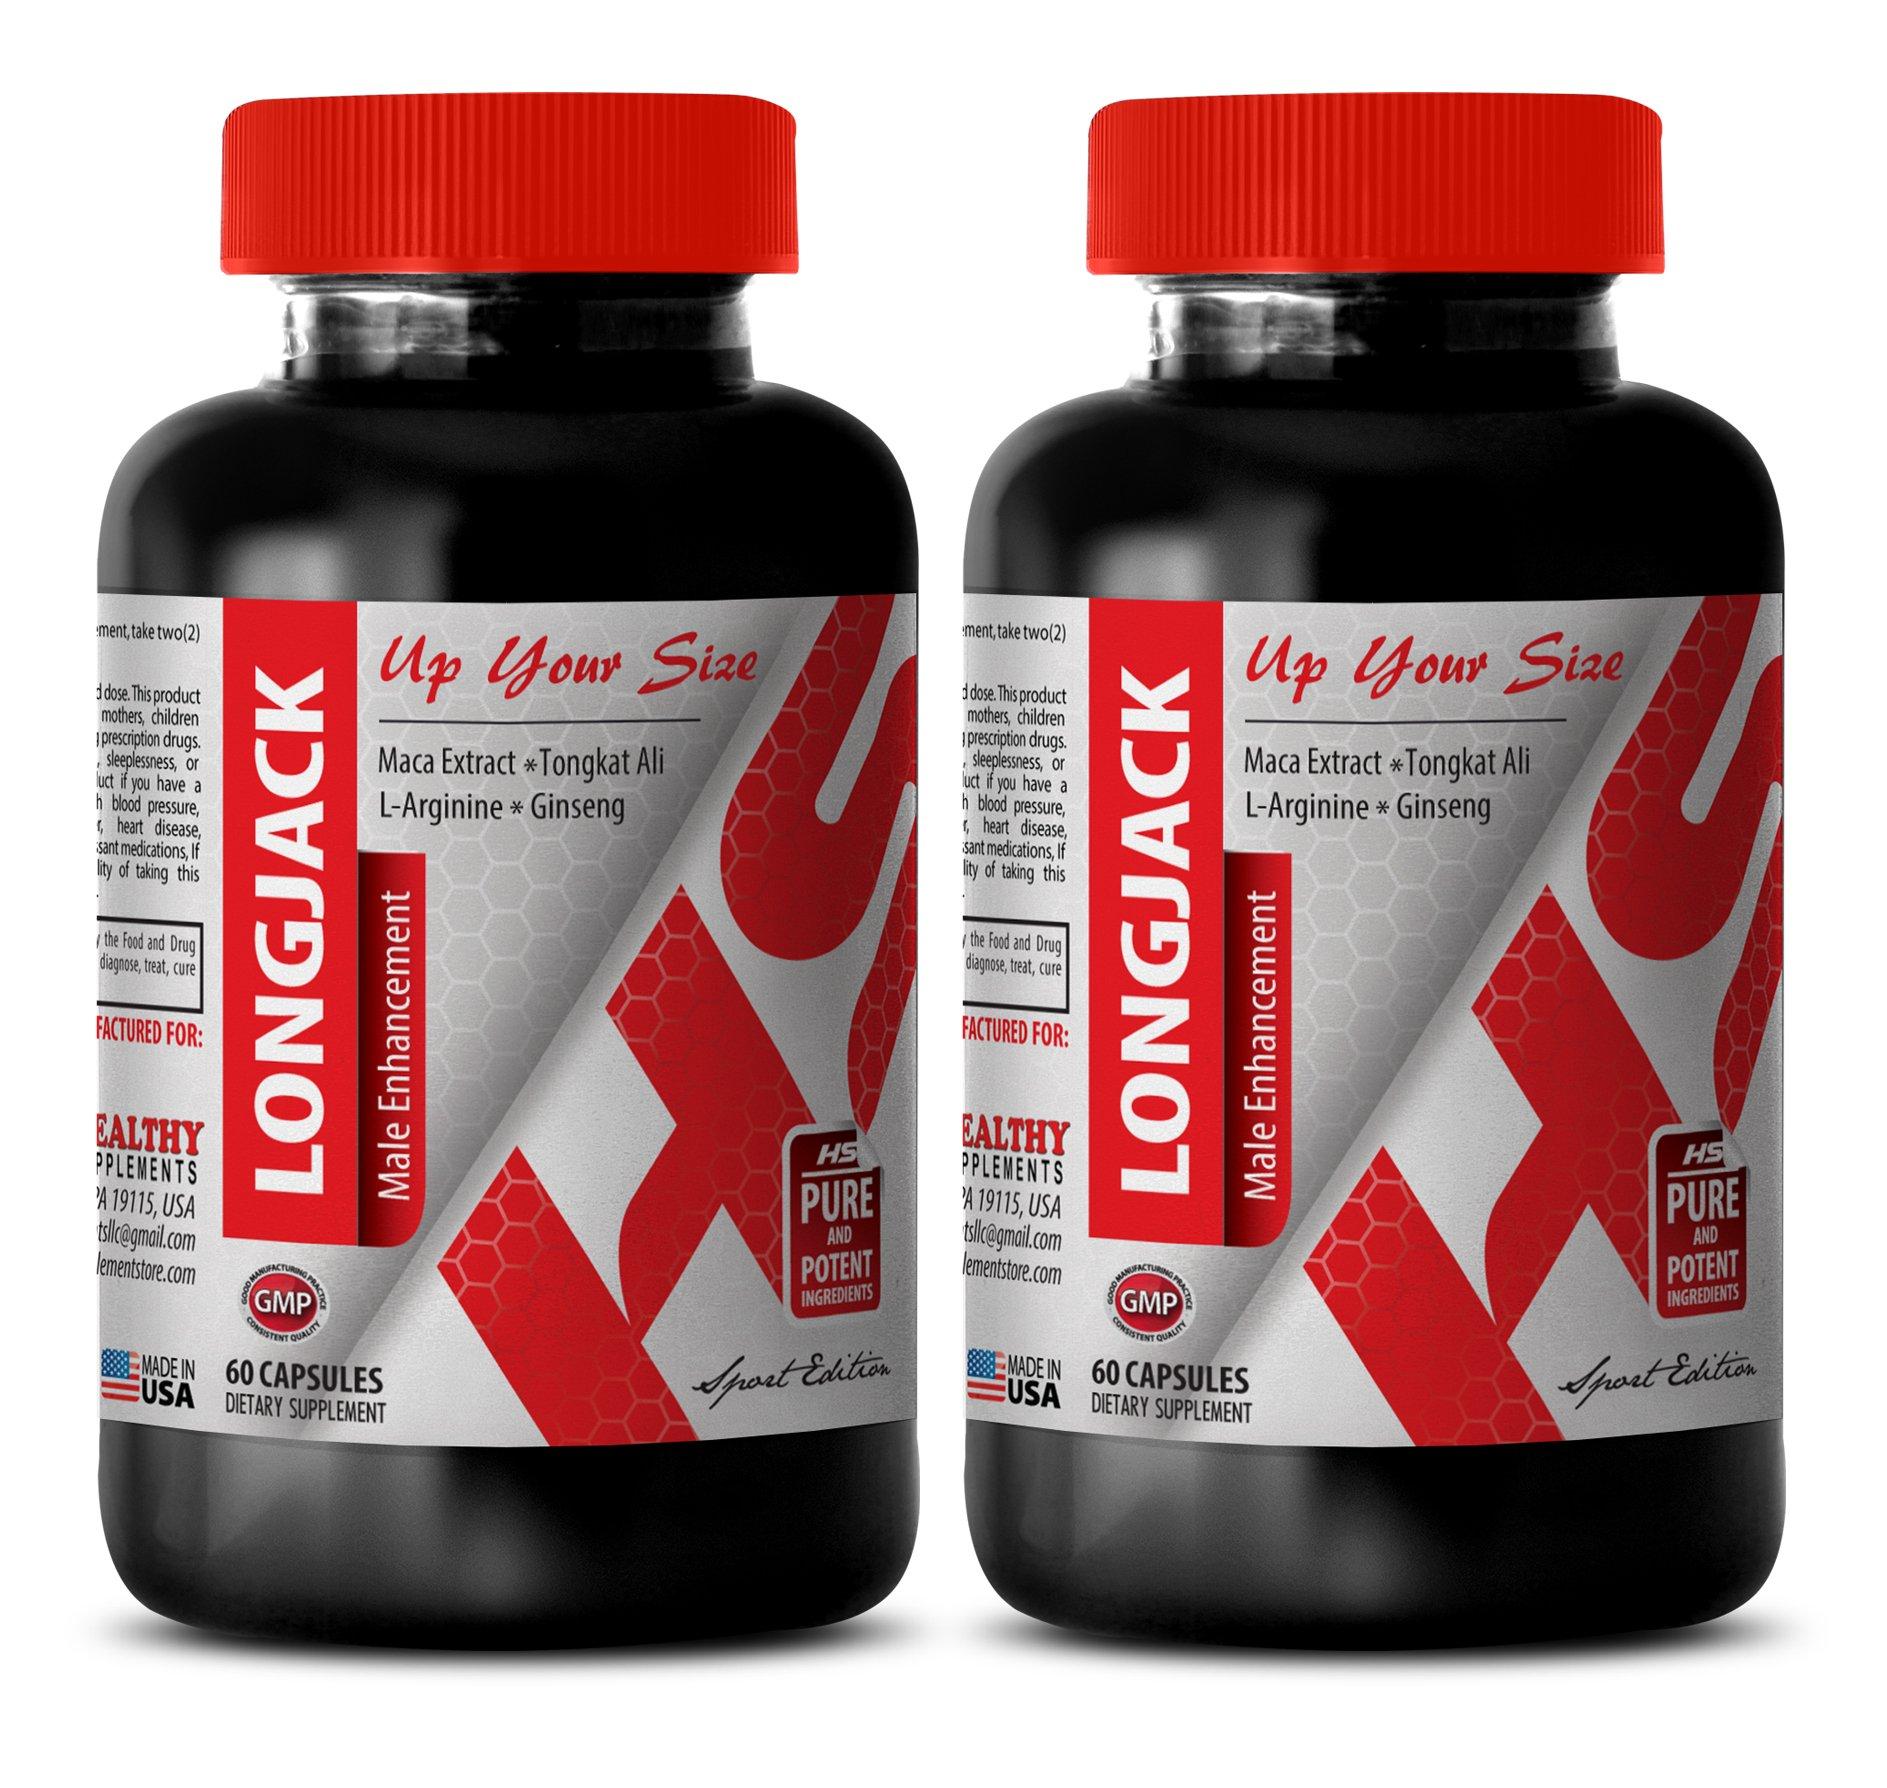 Libido increase men - LONGJACK - MALE ENHANCEMENT - UP YOUR SIZE - Tongkat ali jack - 2 Bottles 120 Capsules